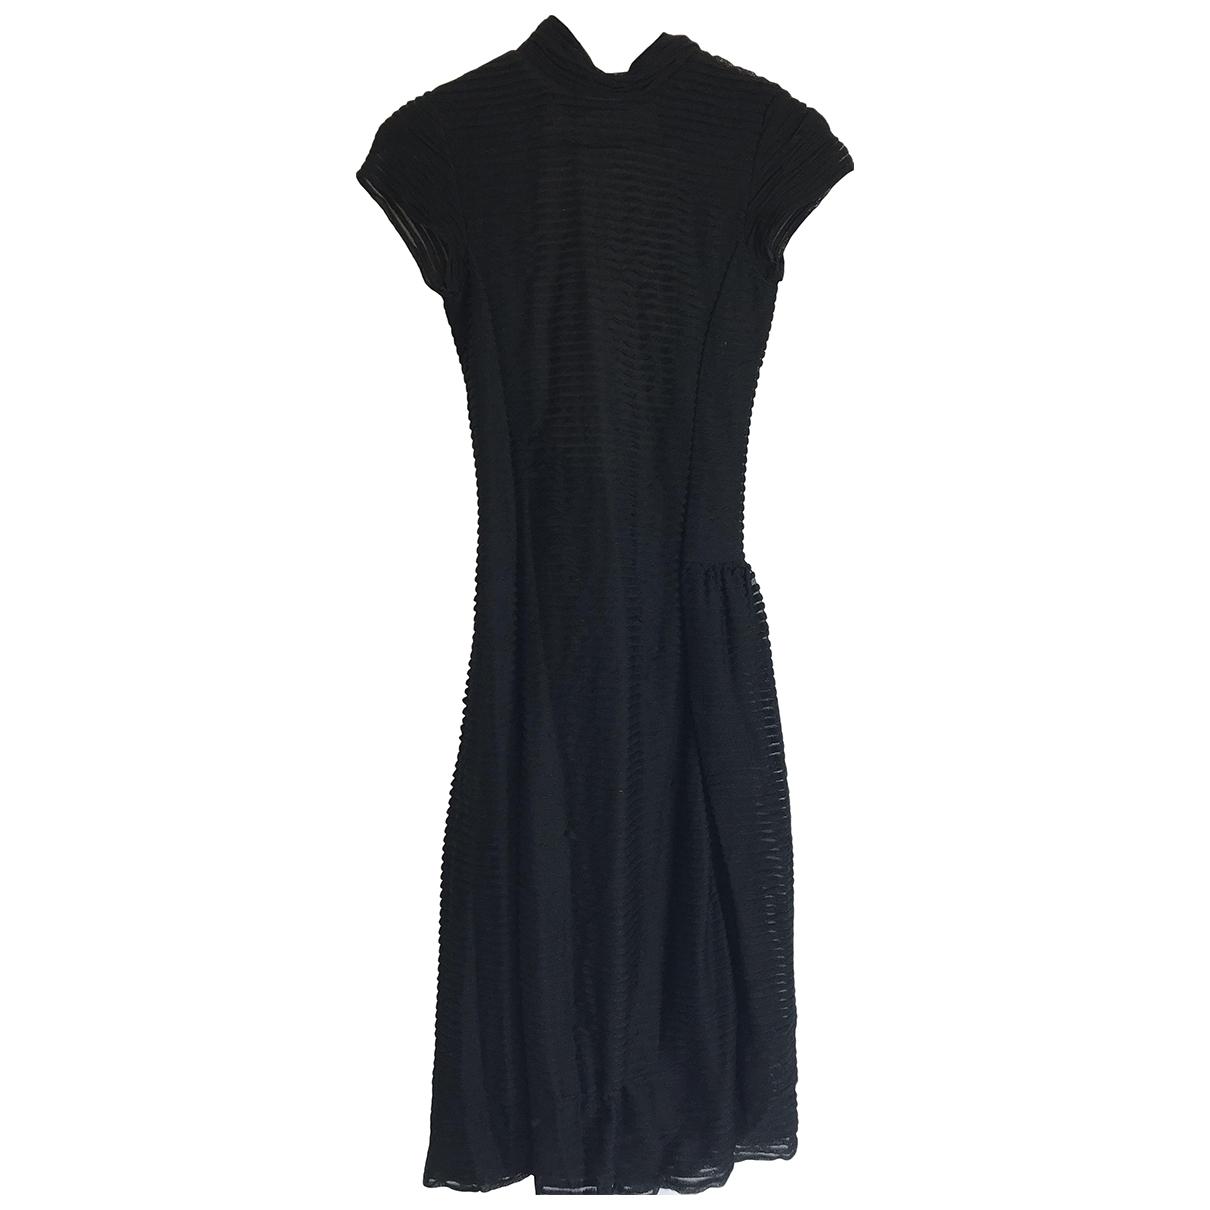 Emporio Armani \N Black dress for Women 12 UK